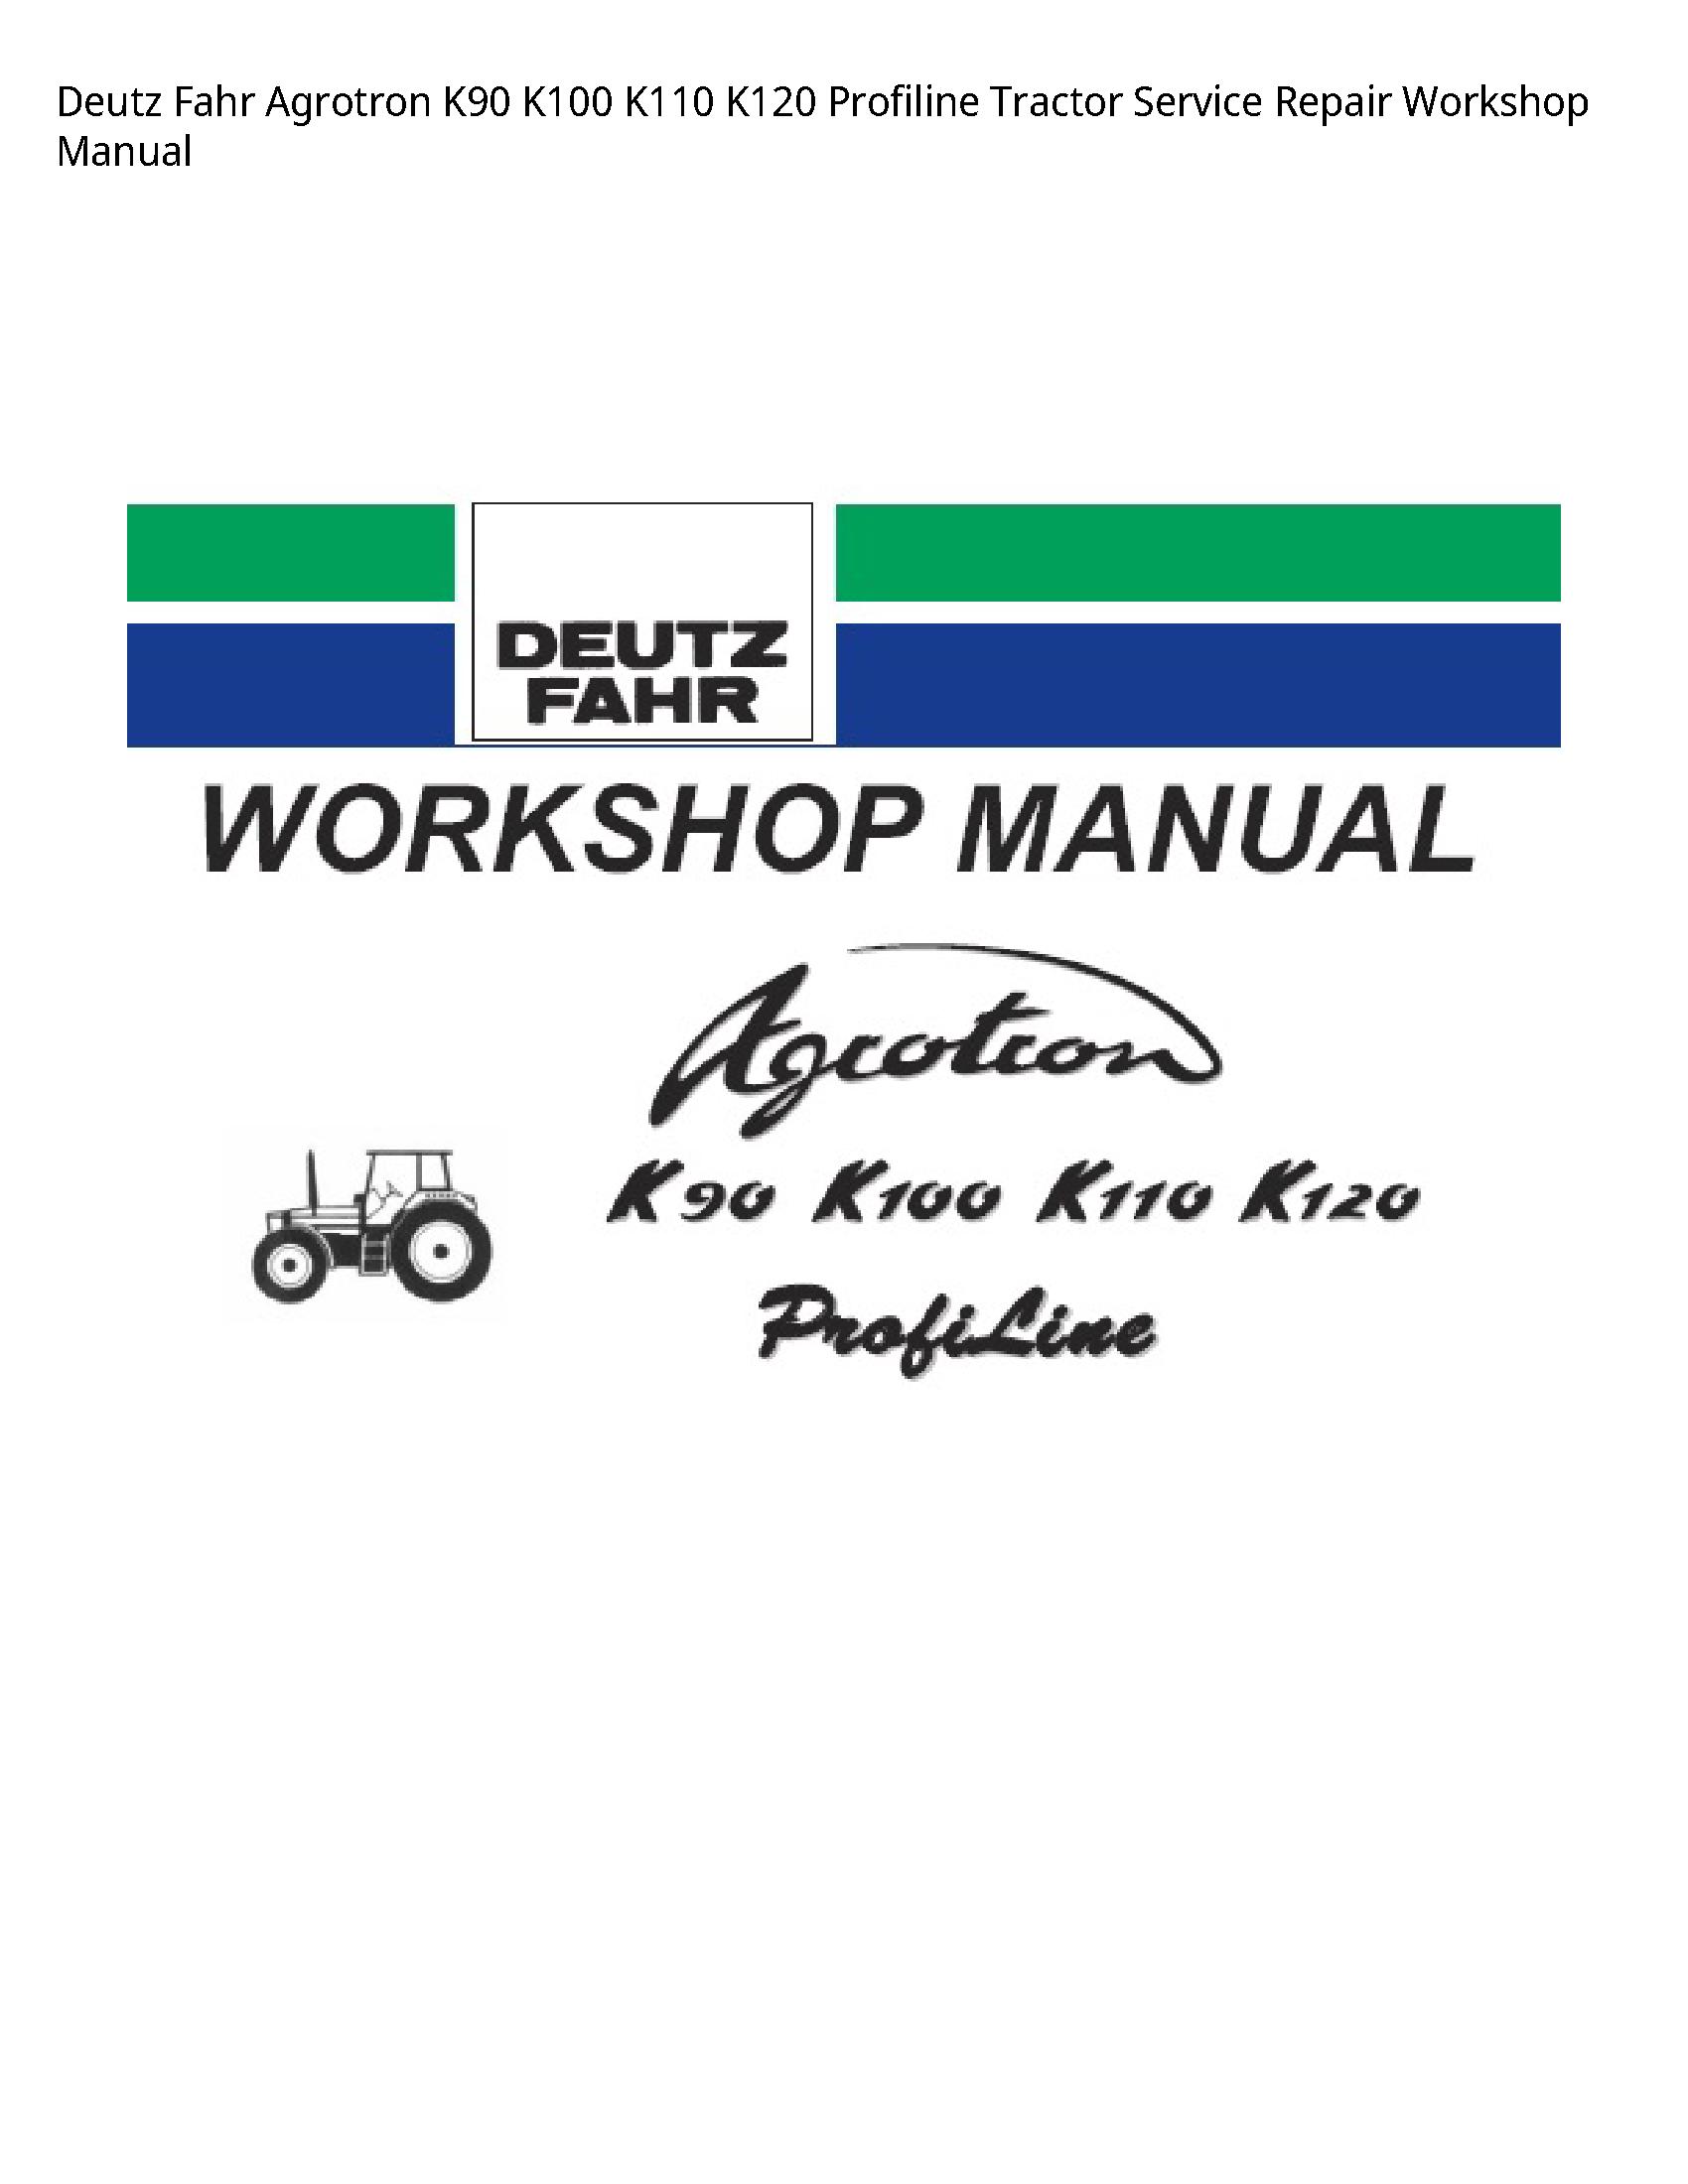 Deutz K90 Fahr Agrotron Profiline Tractor manual